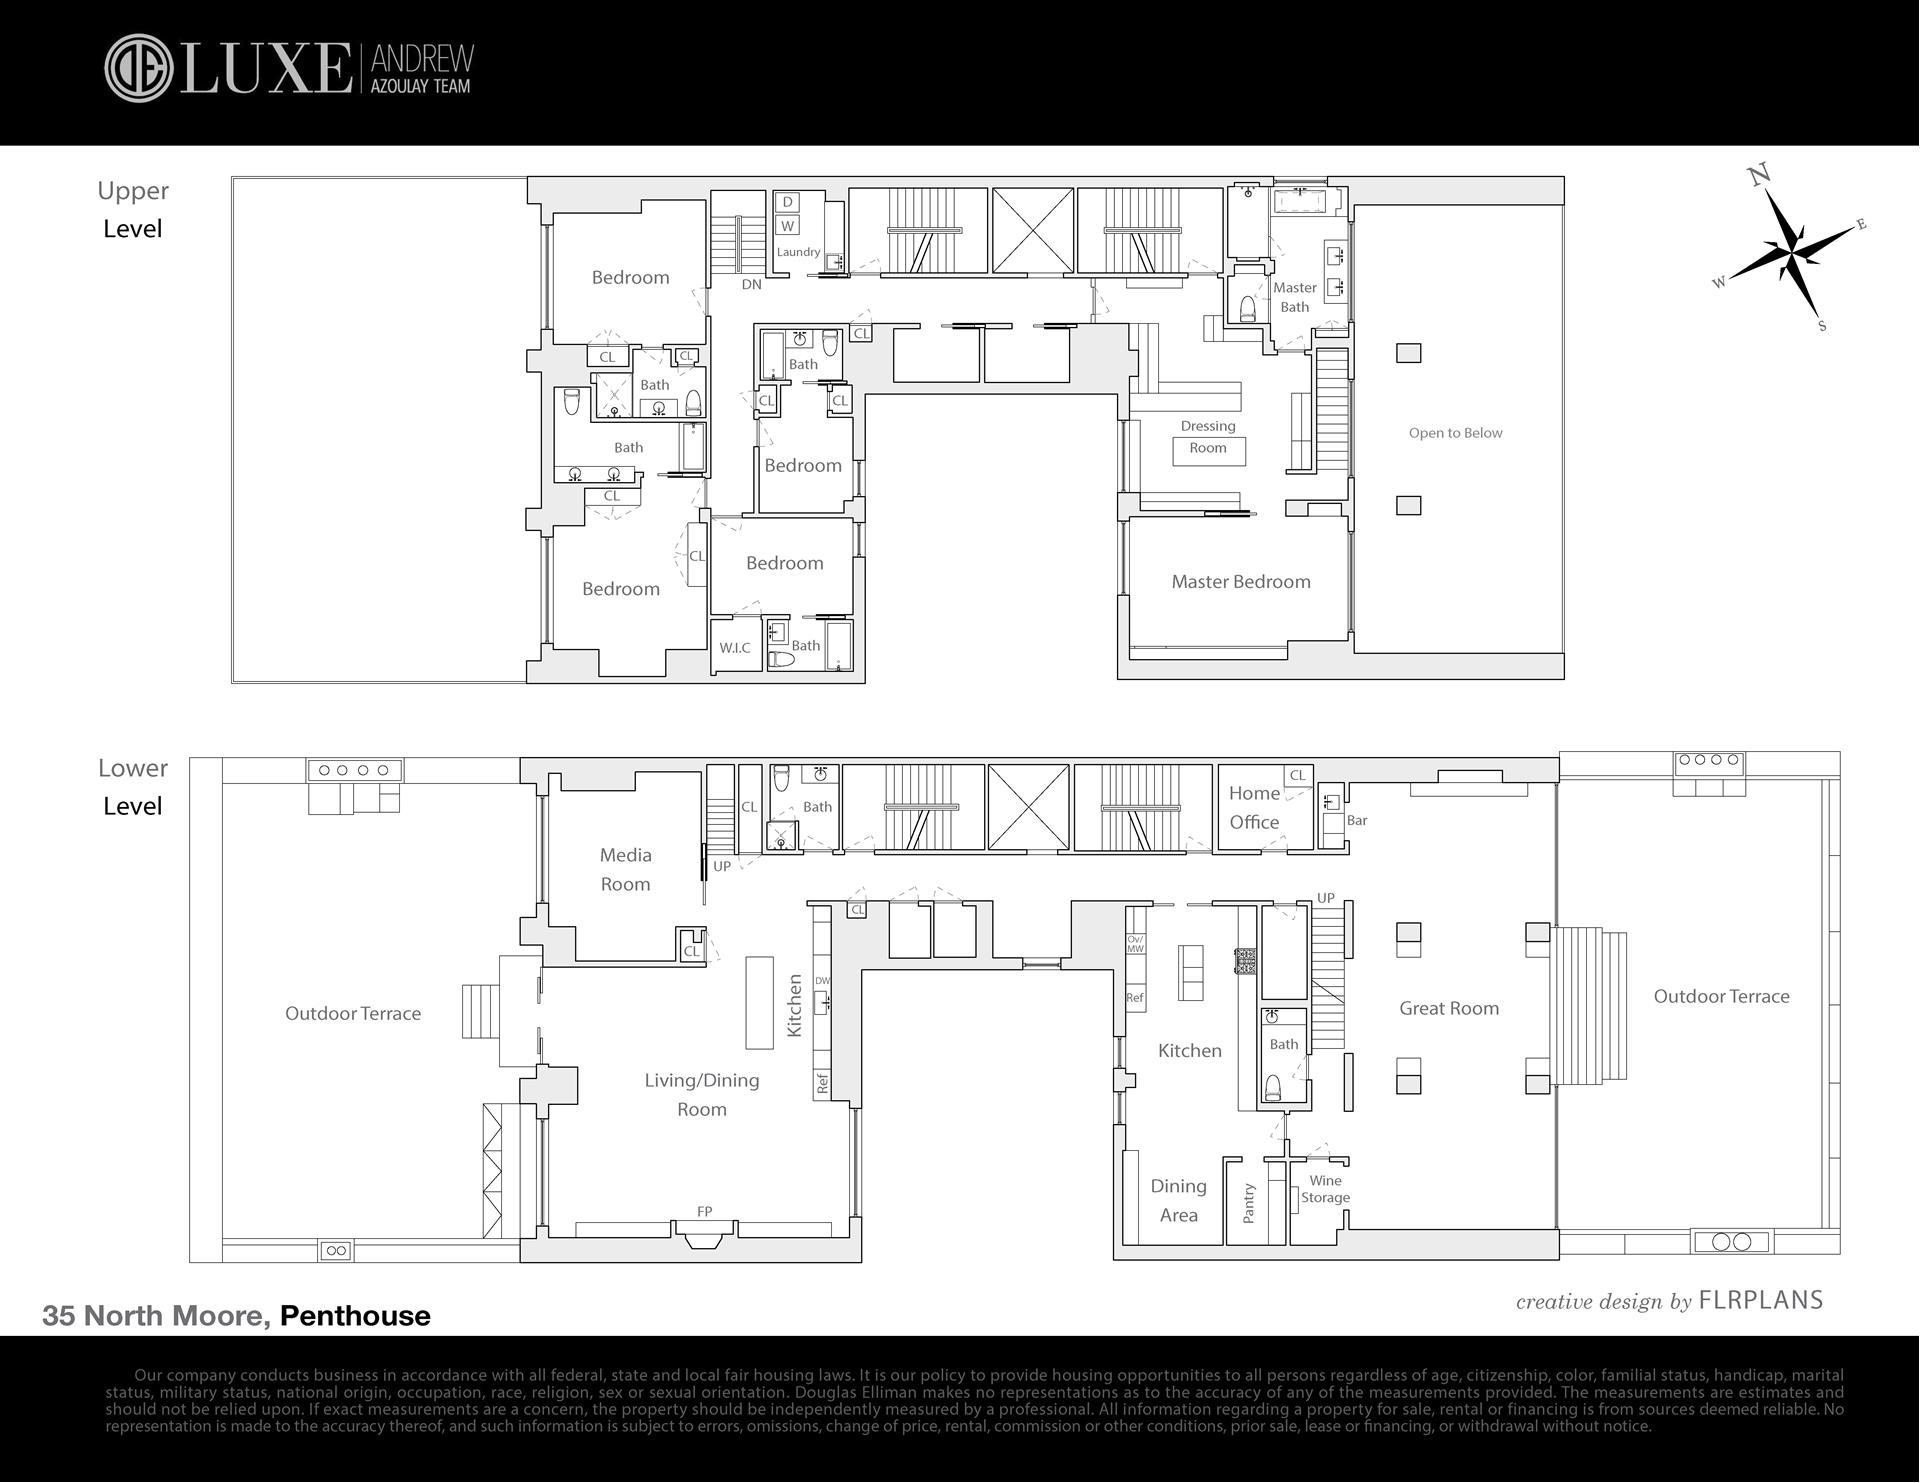 Floor plan of Merchant House, 35 North Moore St, PHA - TriBeCa, New York